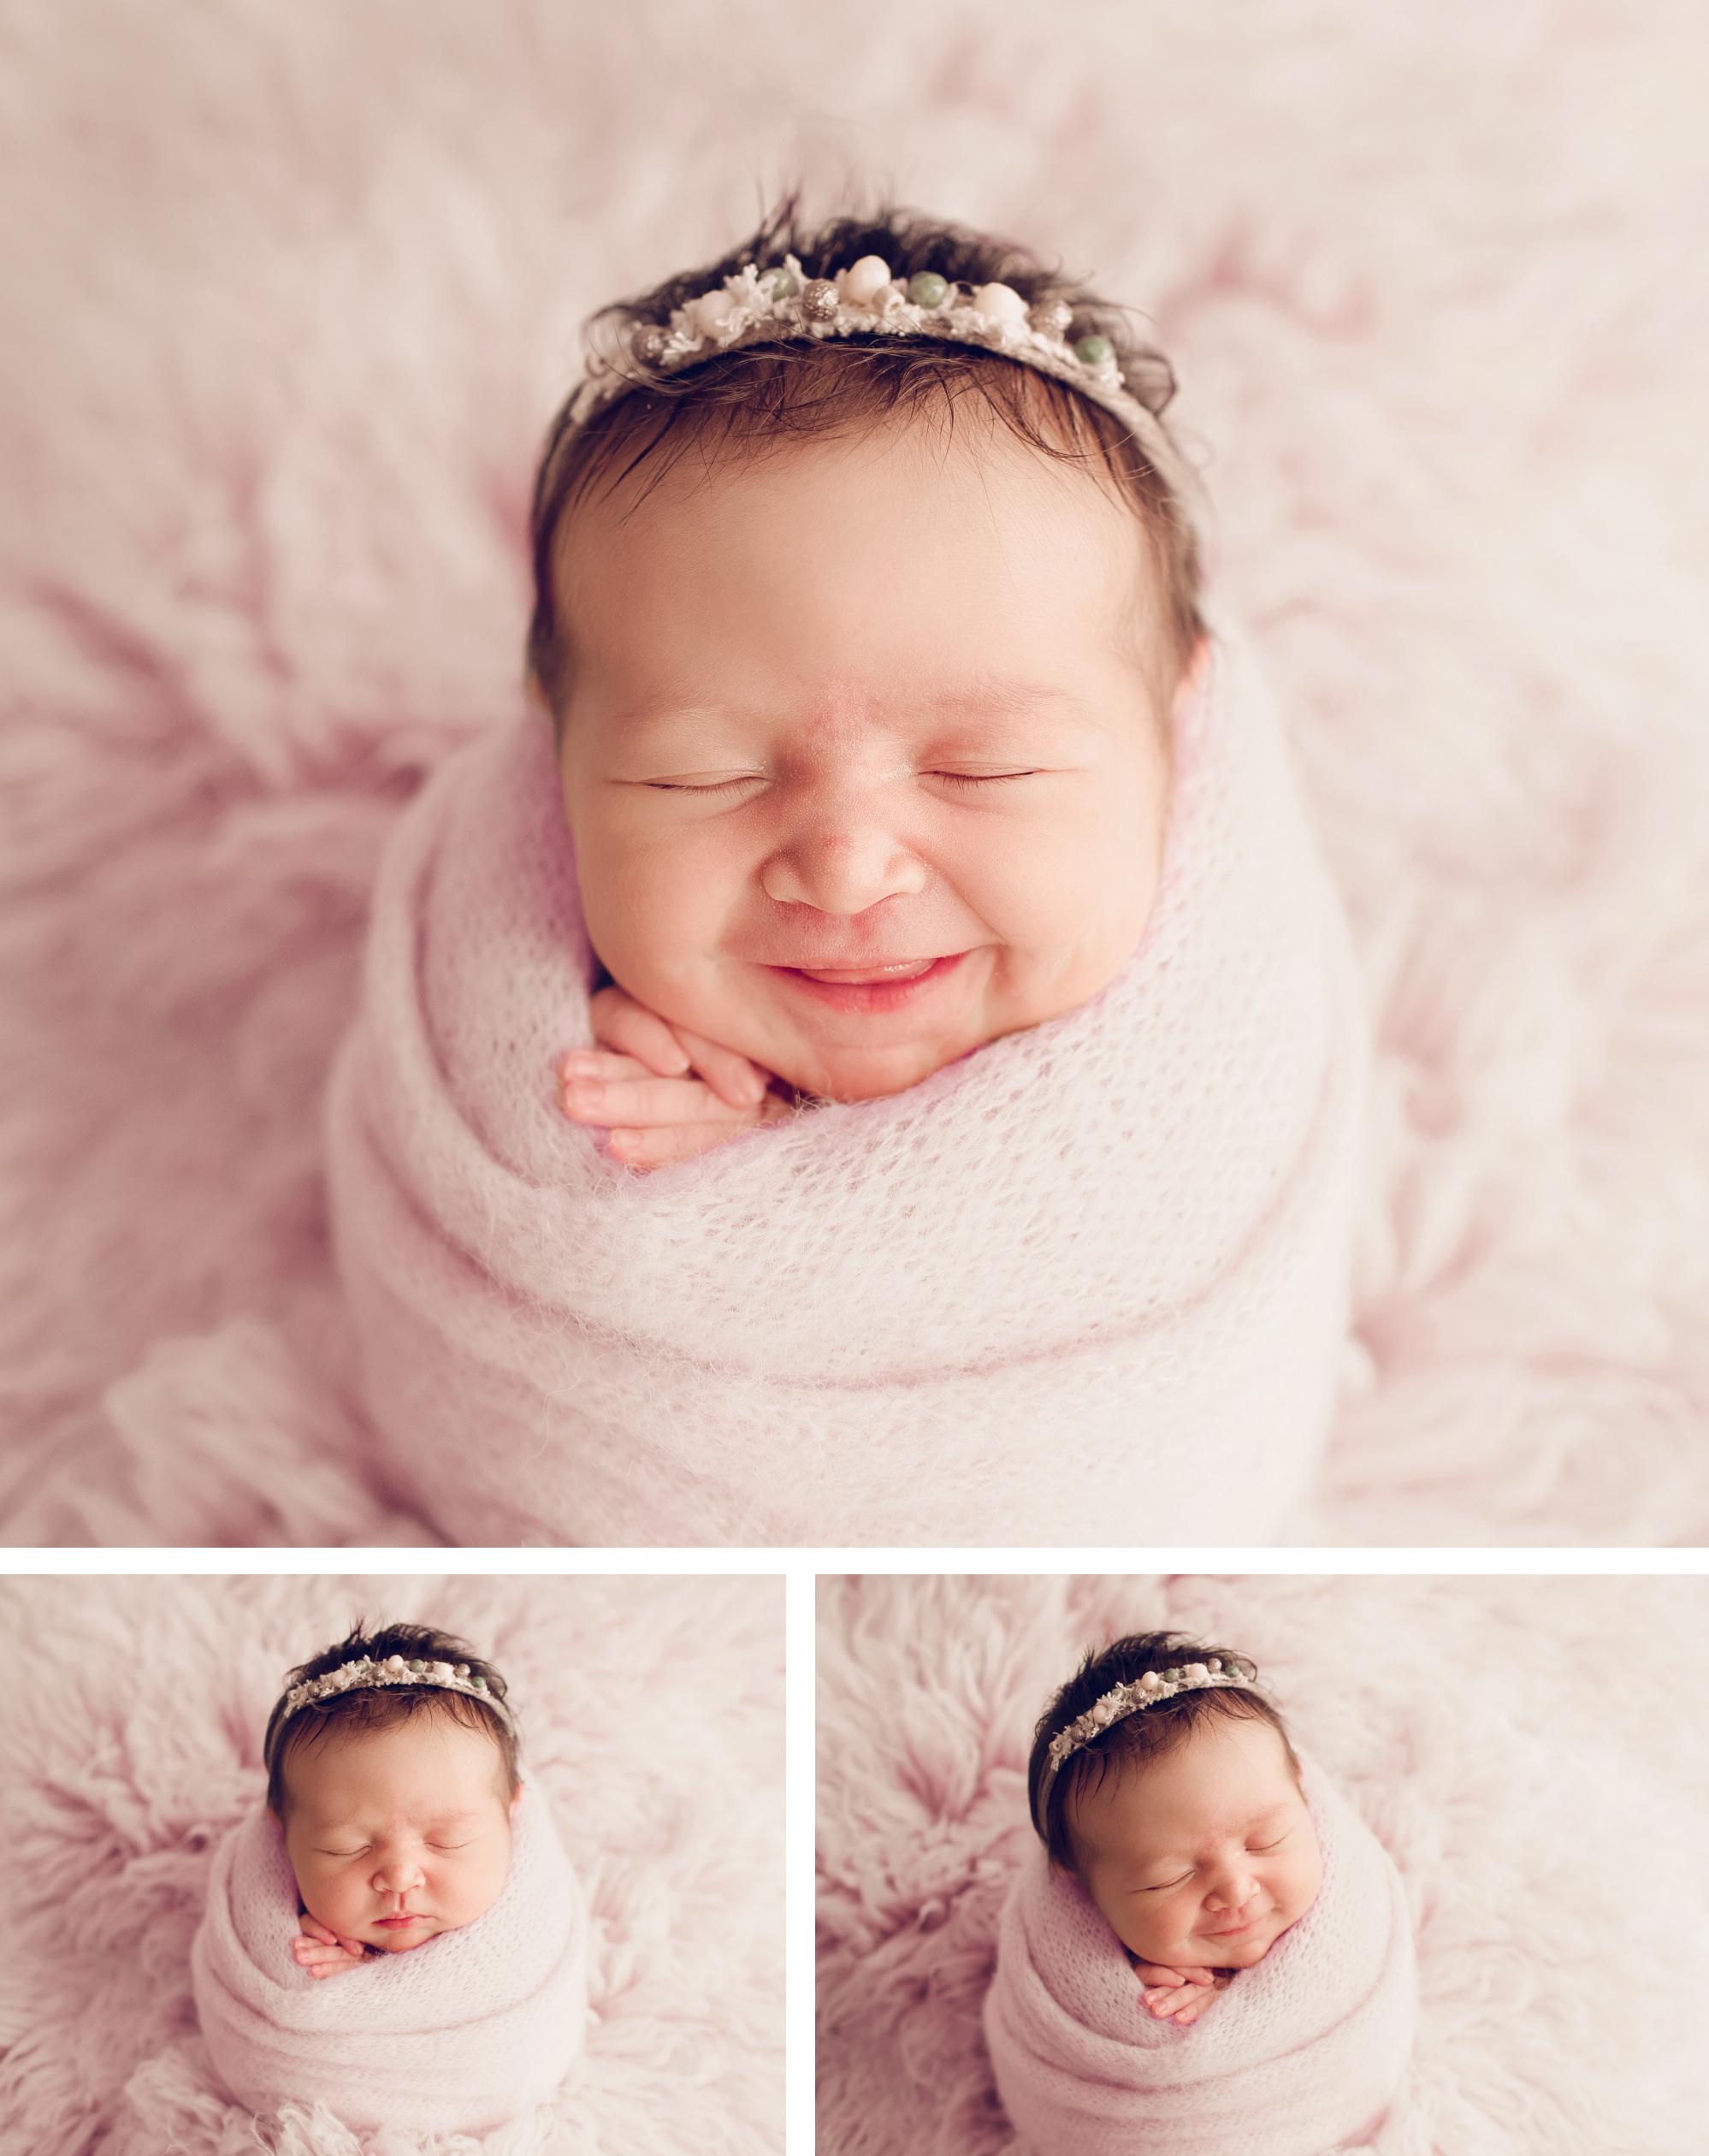 Little Hat Photography - Laura Teague 2